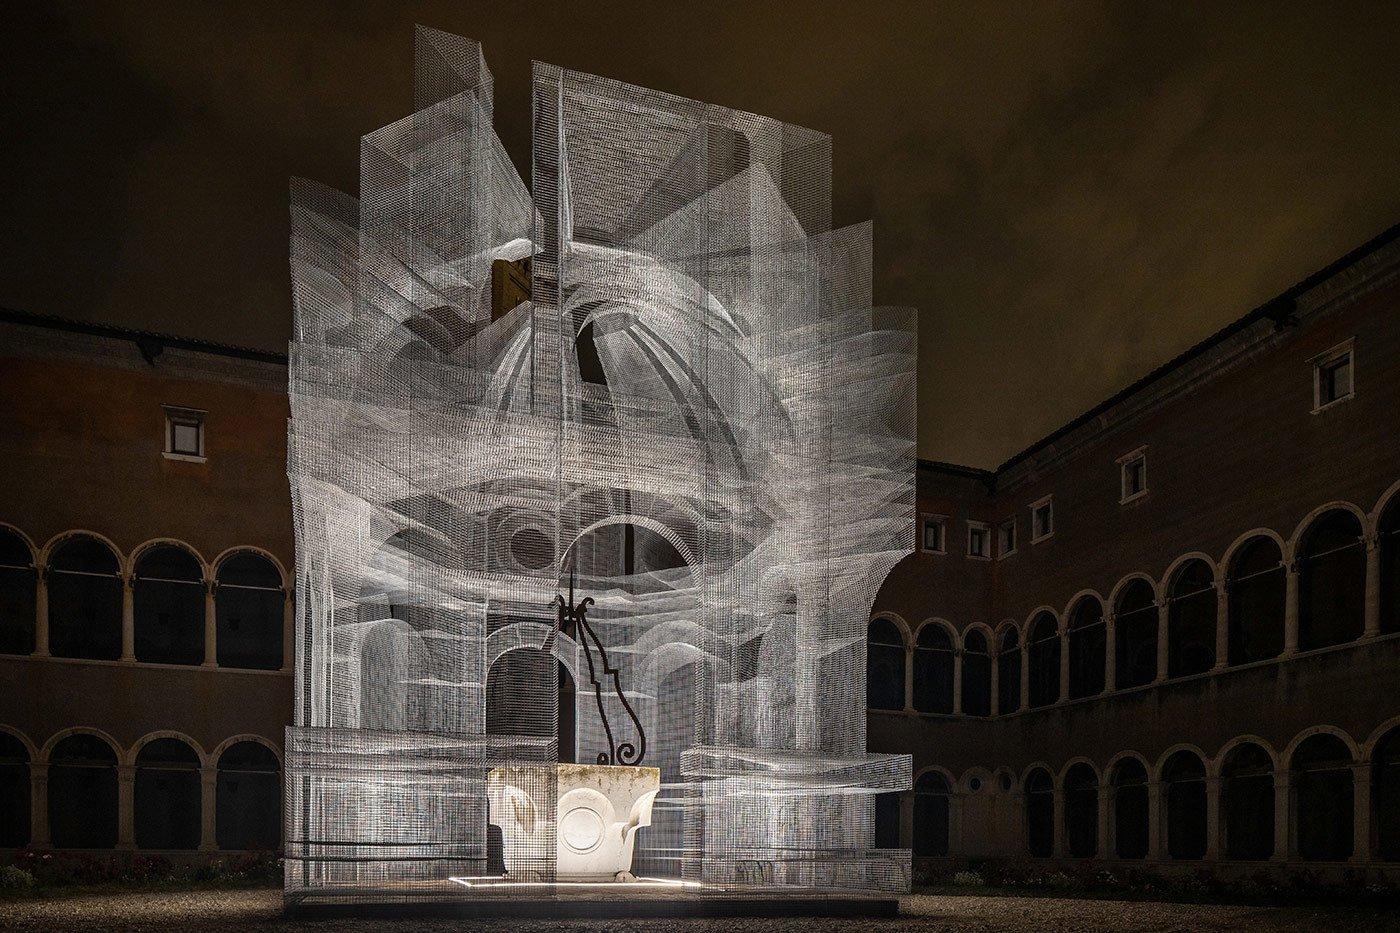 Filigrane Drahtarchitekturen von Edoardo Tresoldi